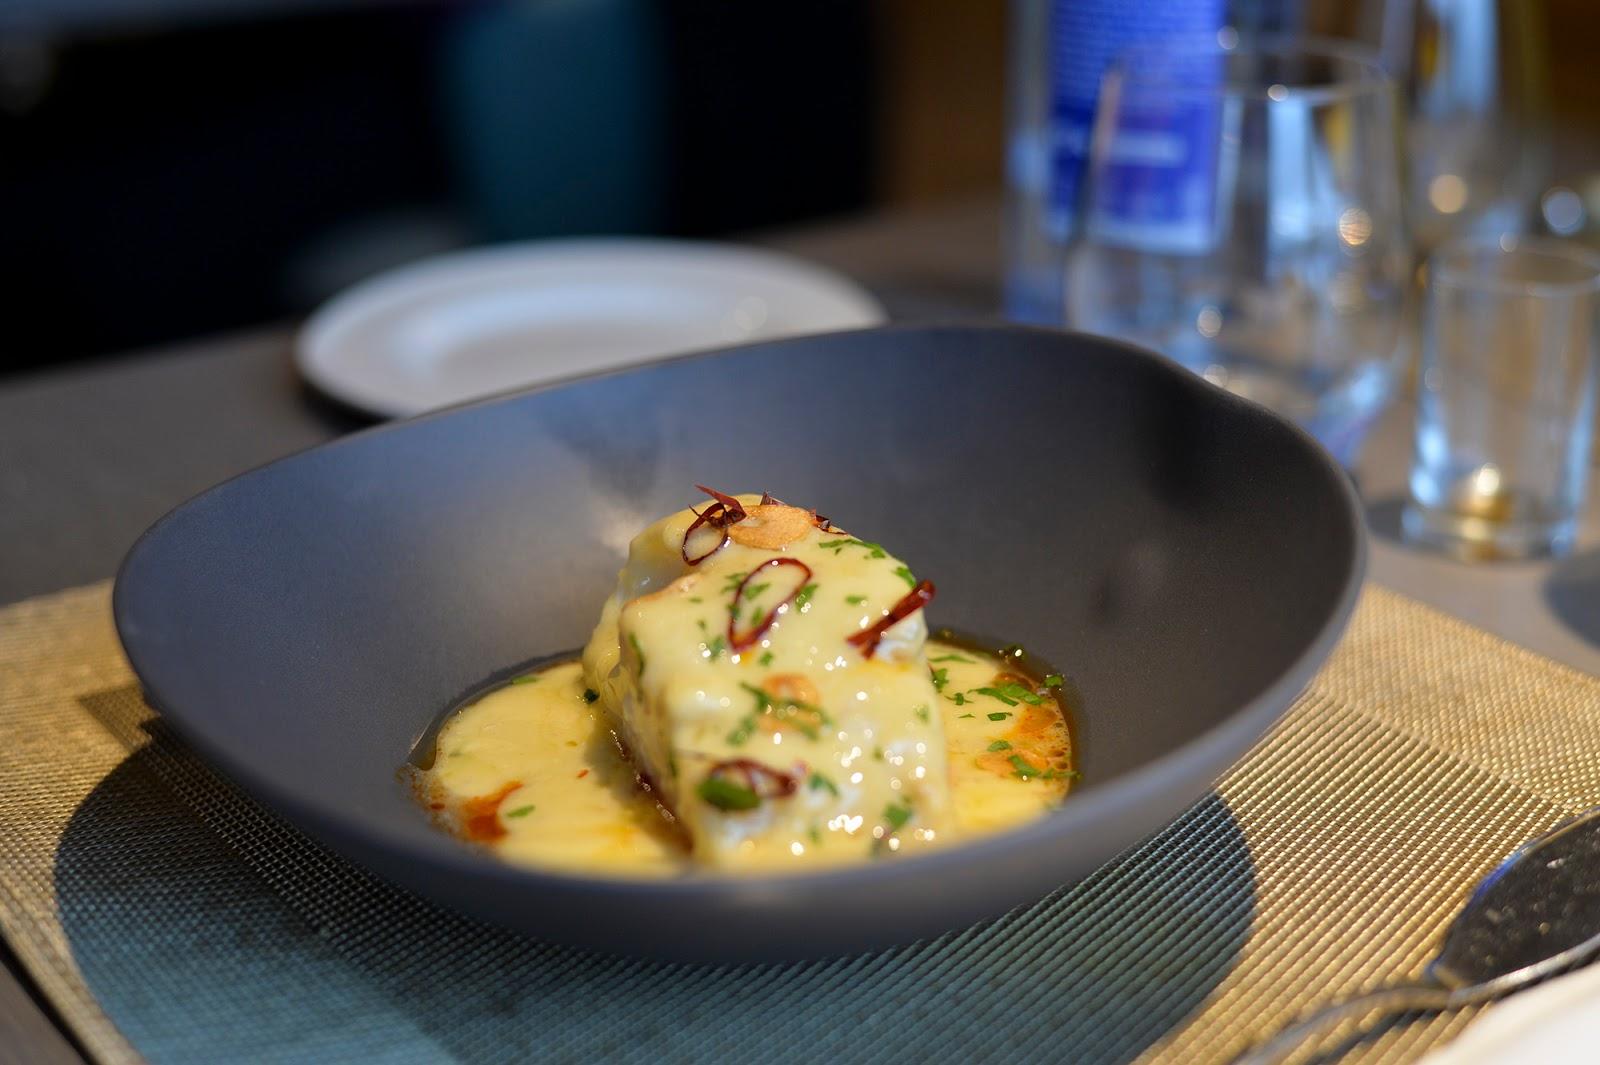 nimu azotea rooftop restaurant leon menu cod bacalao